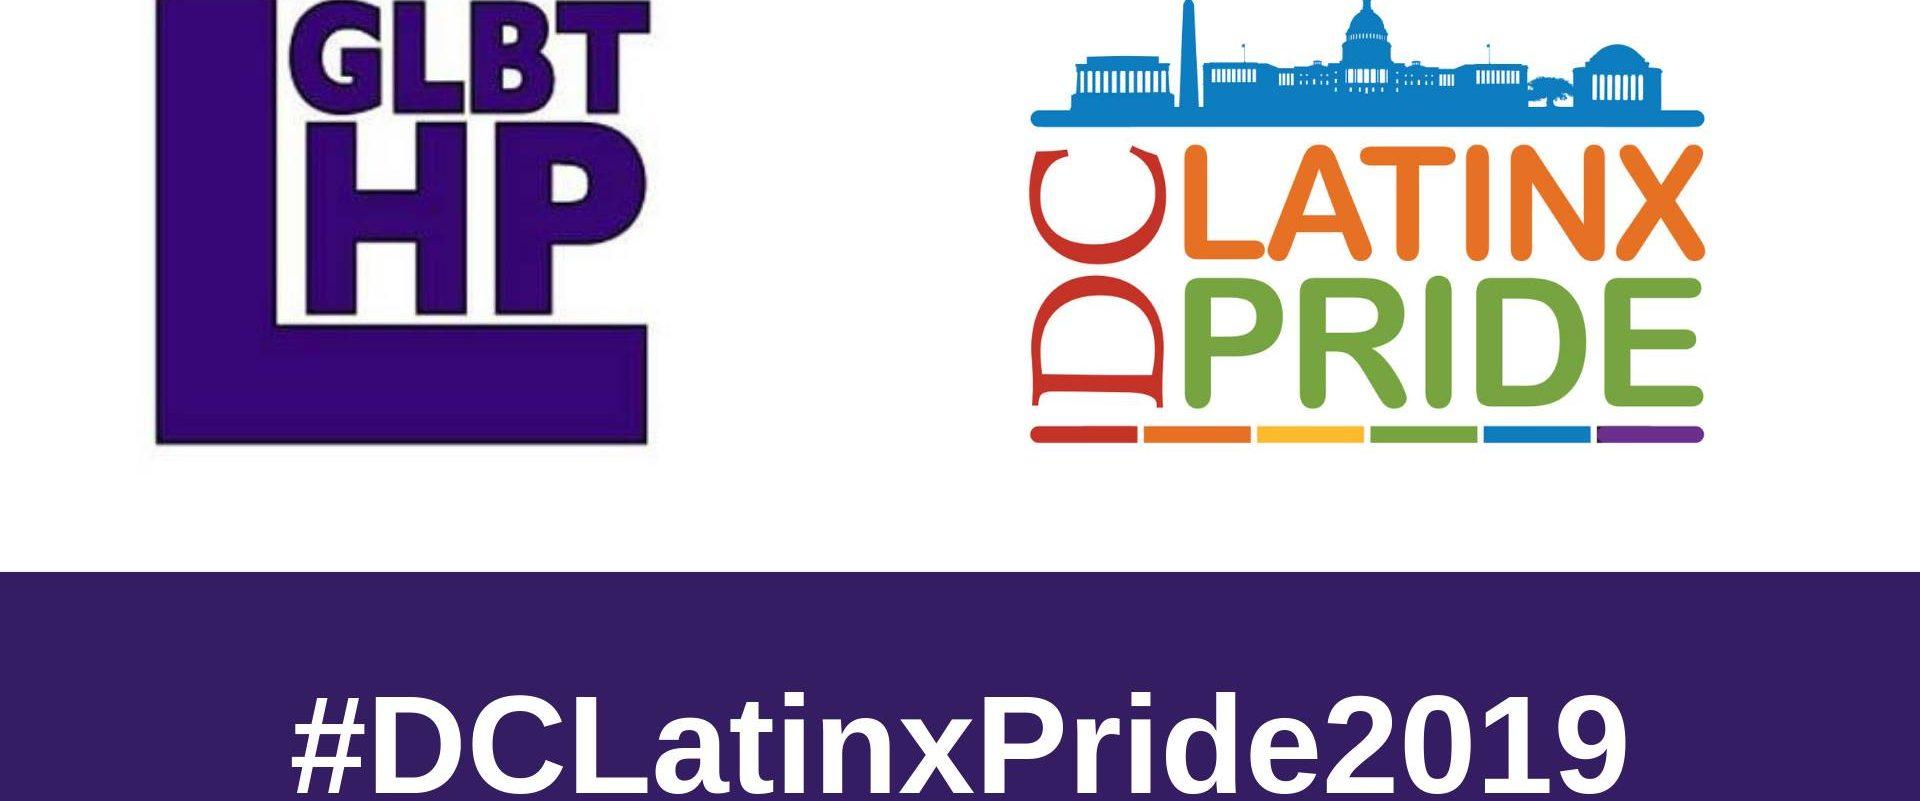 LHP DC Latinx Pride 2019 logo